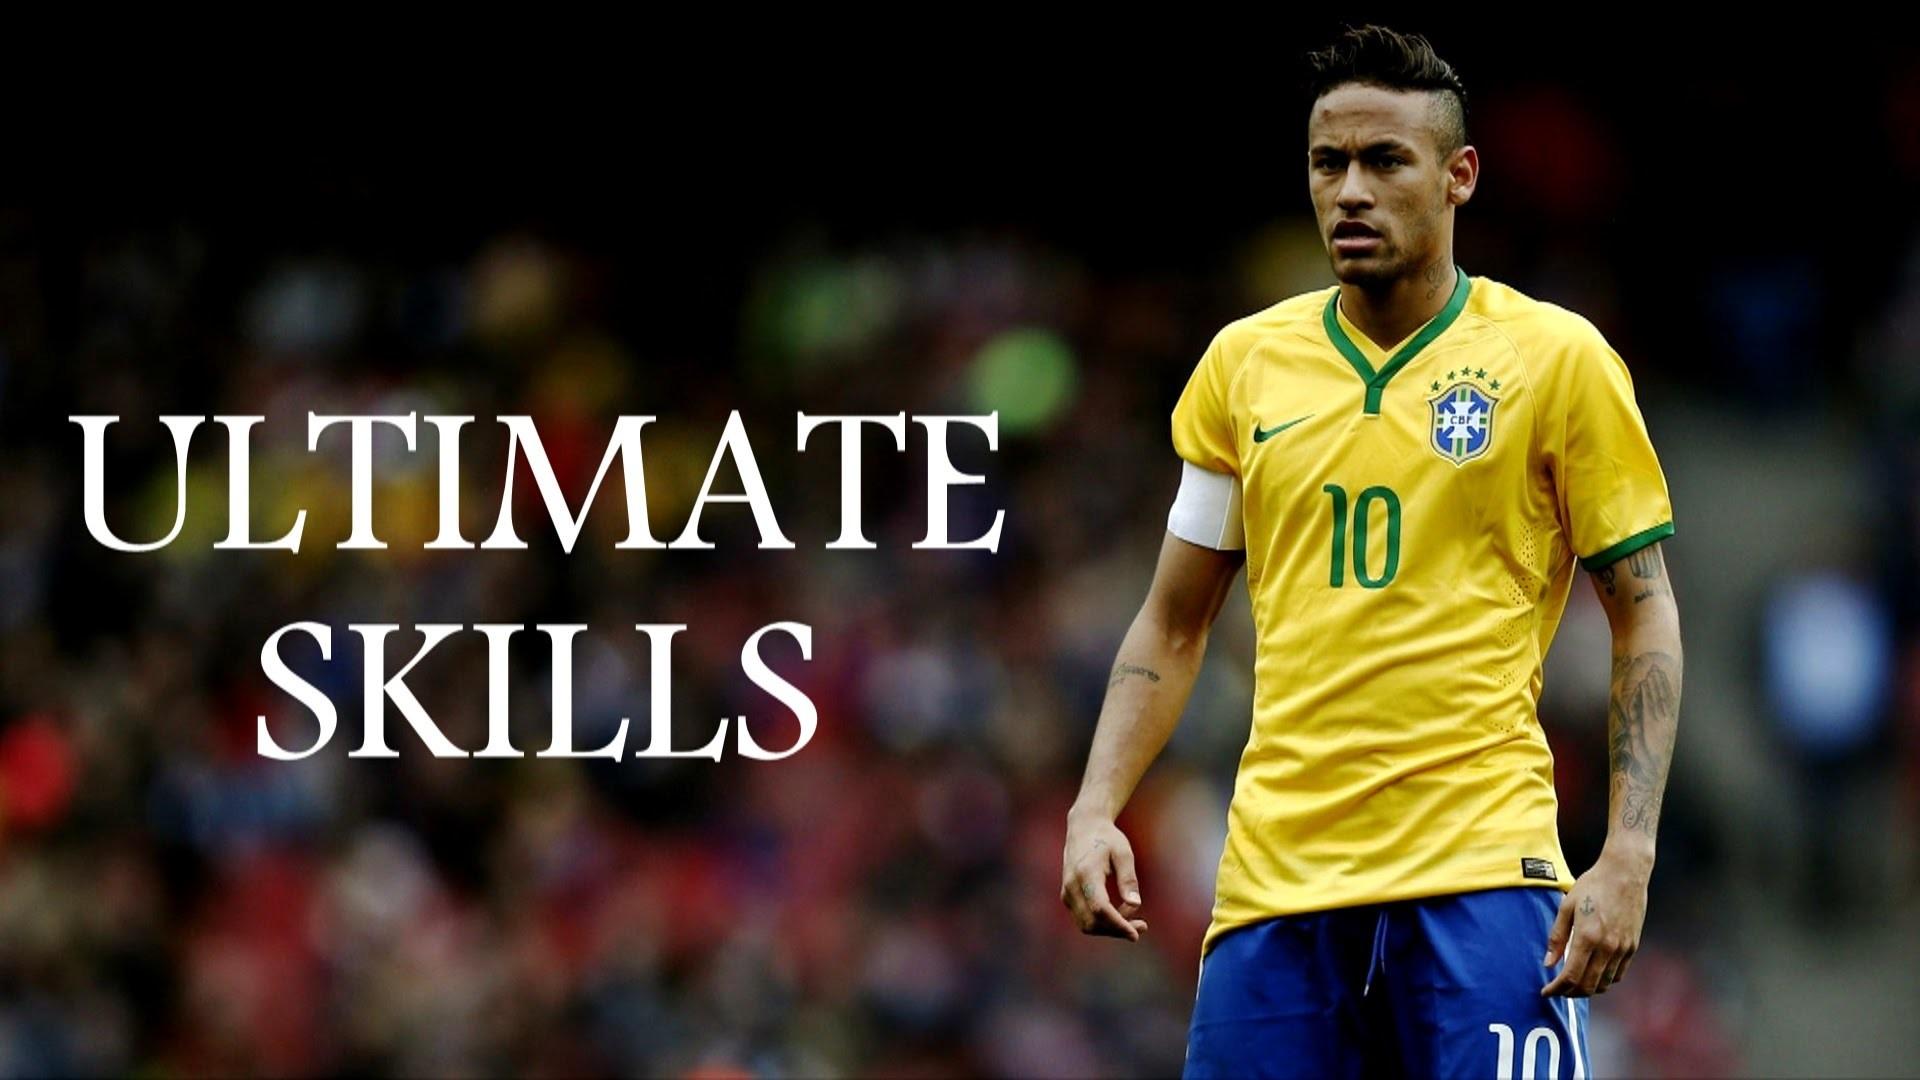 Hd Images Of Neymar: Neymar Brazil Wallpaper 2018 HD (74+ Images